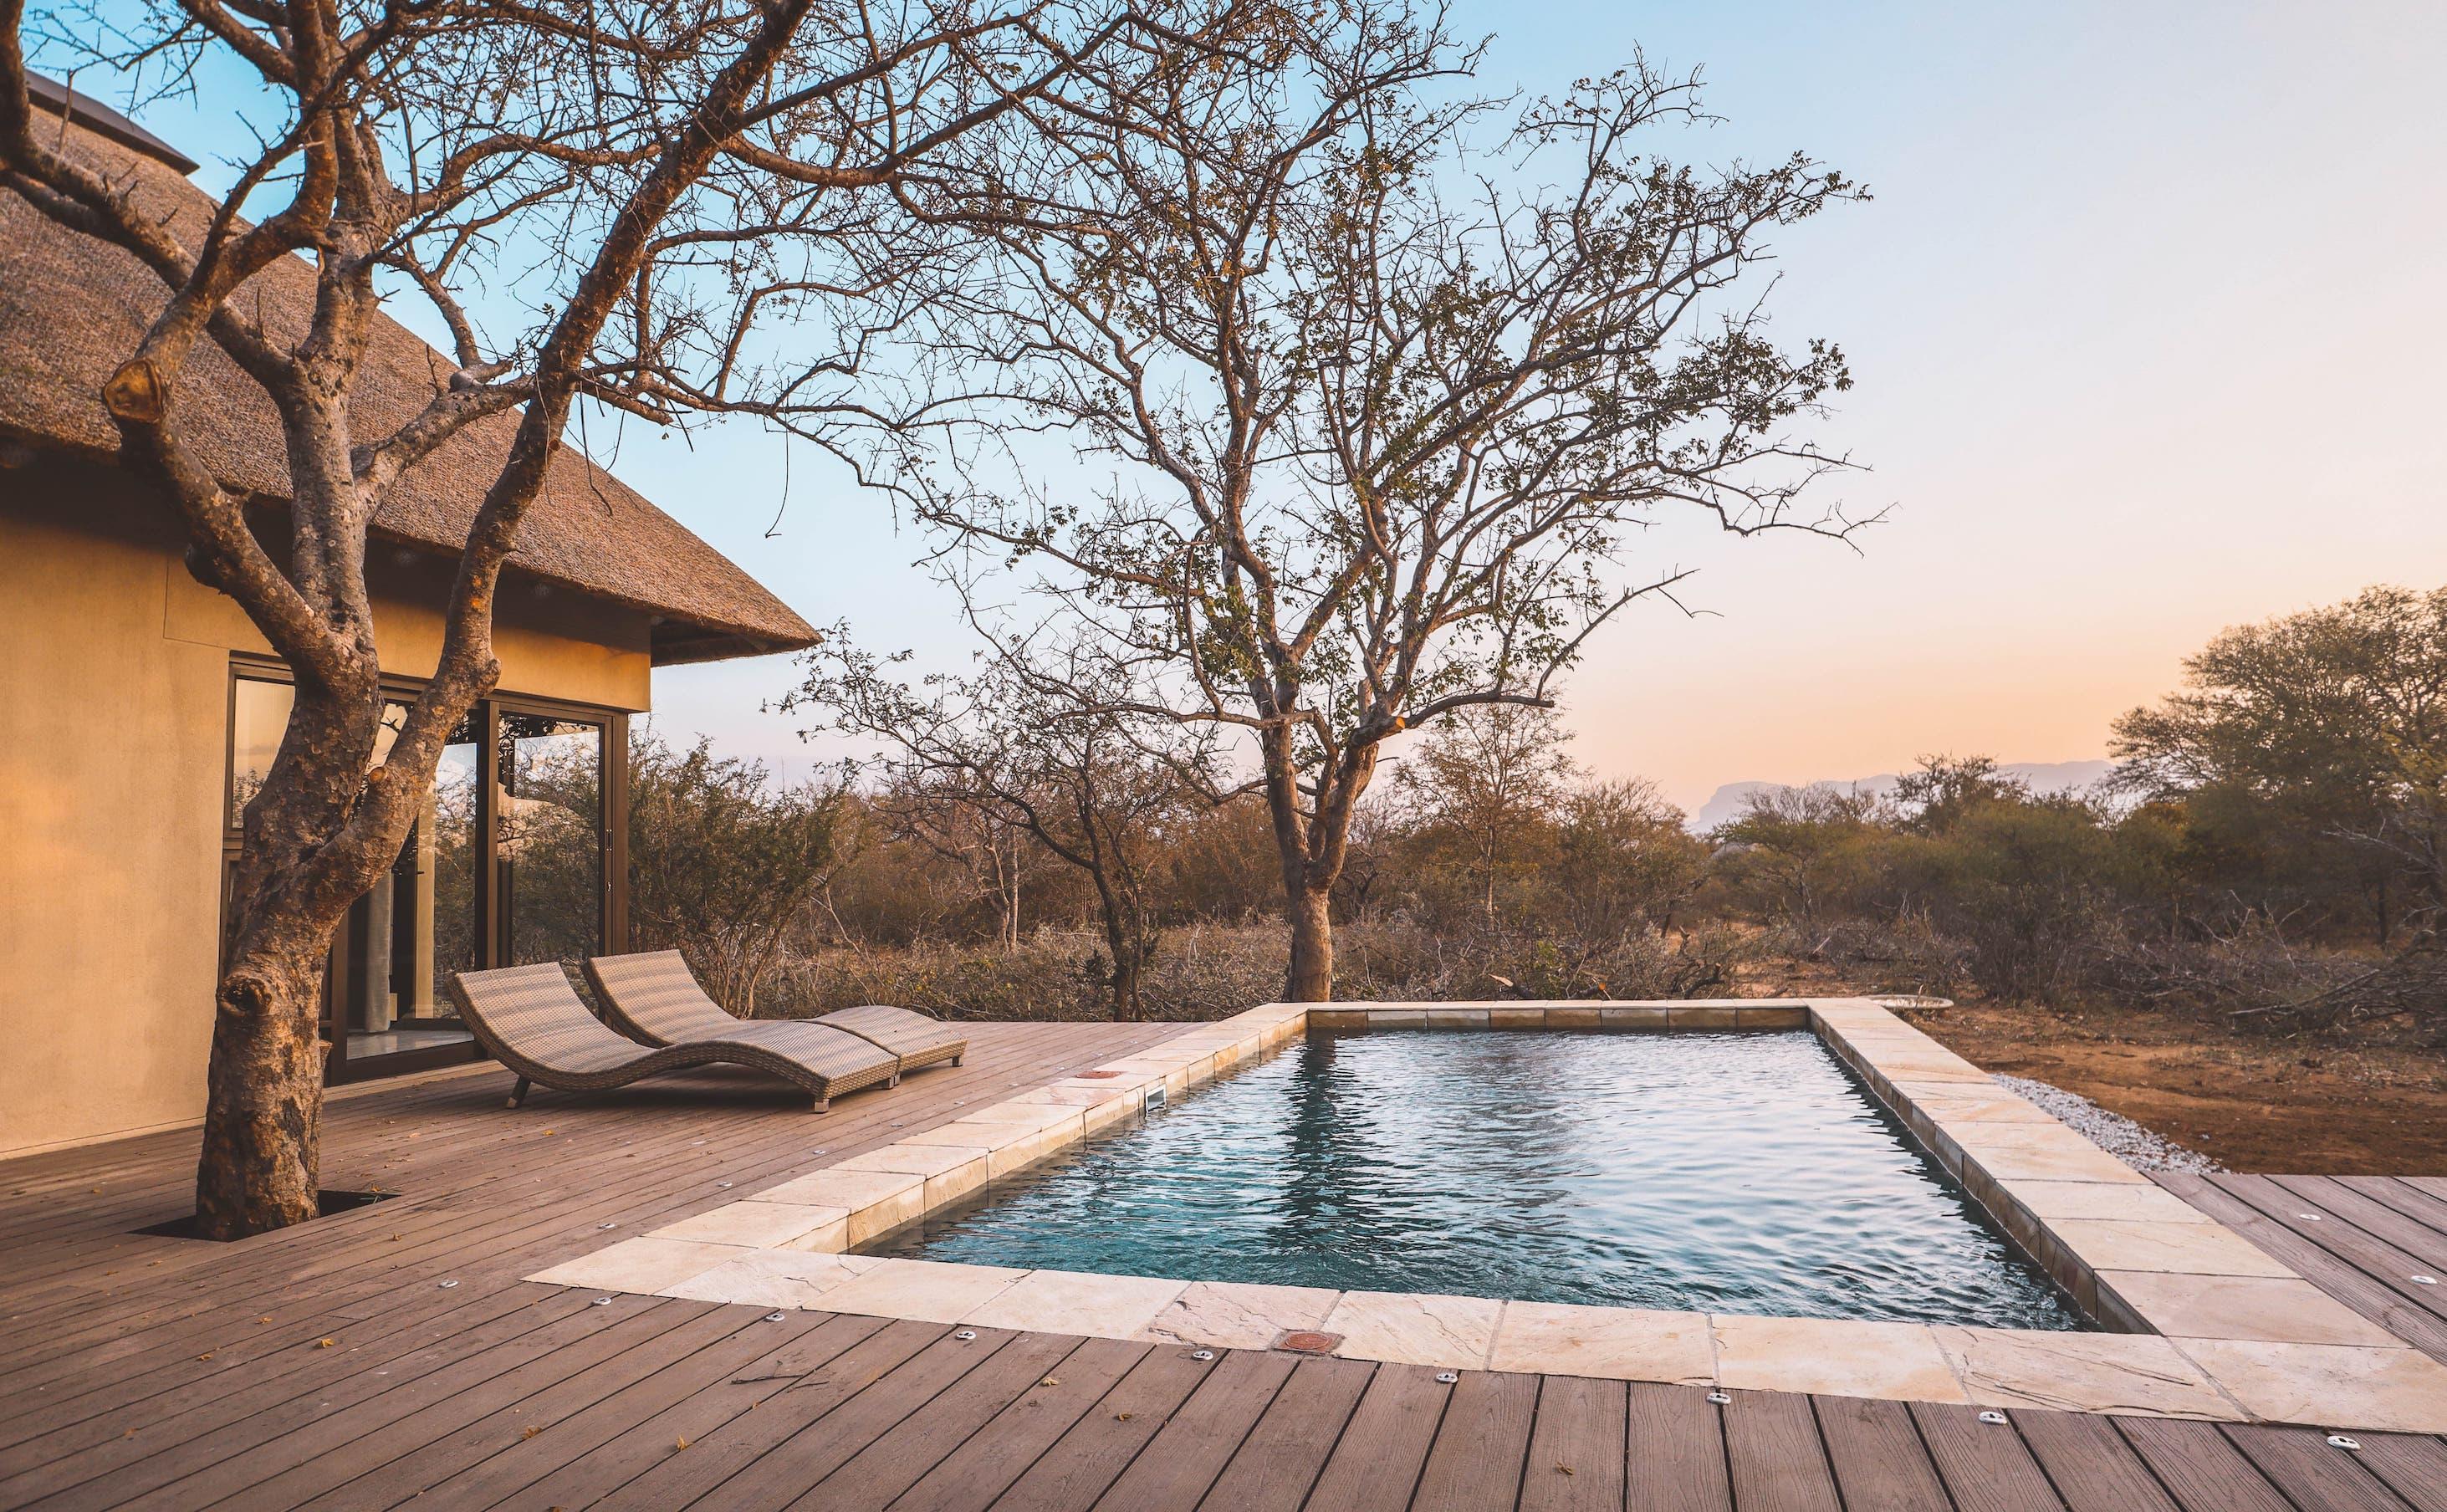 Lowveld Escape vakantiehuizen